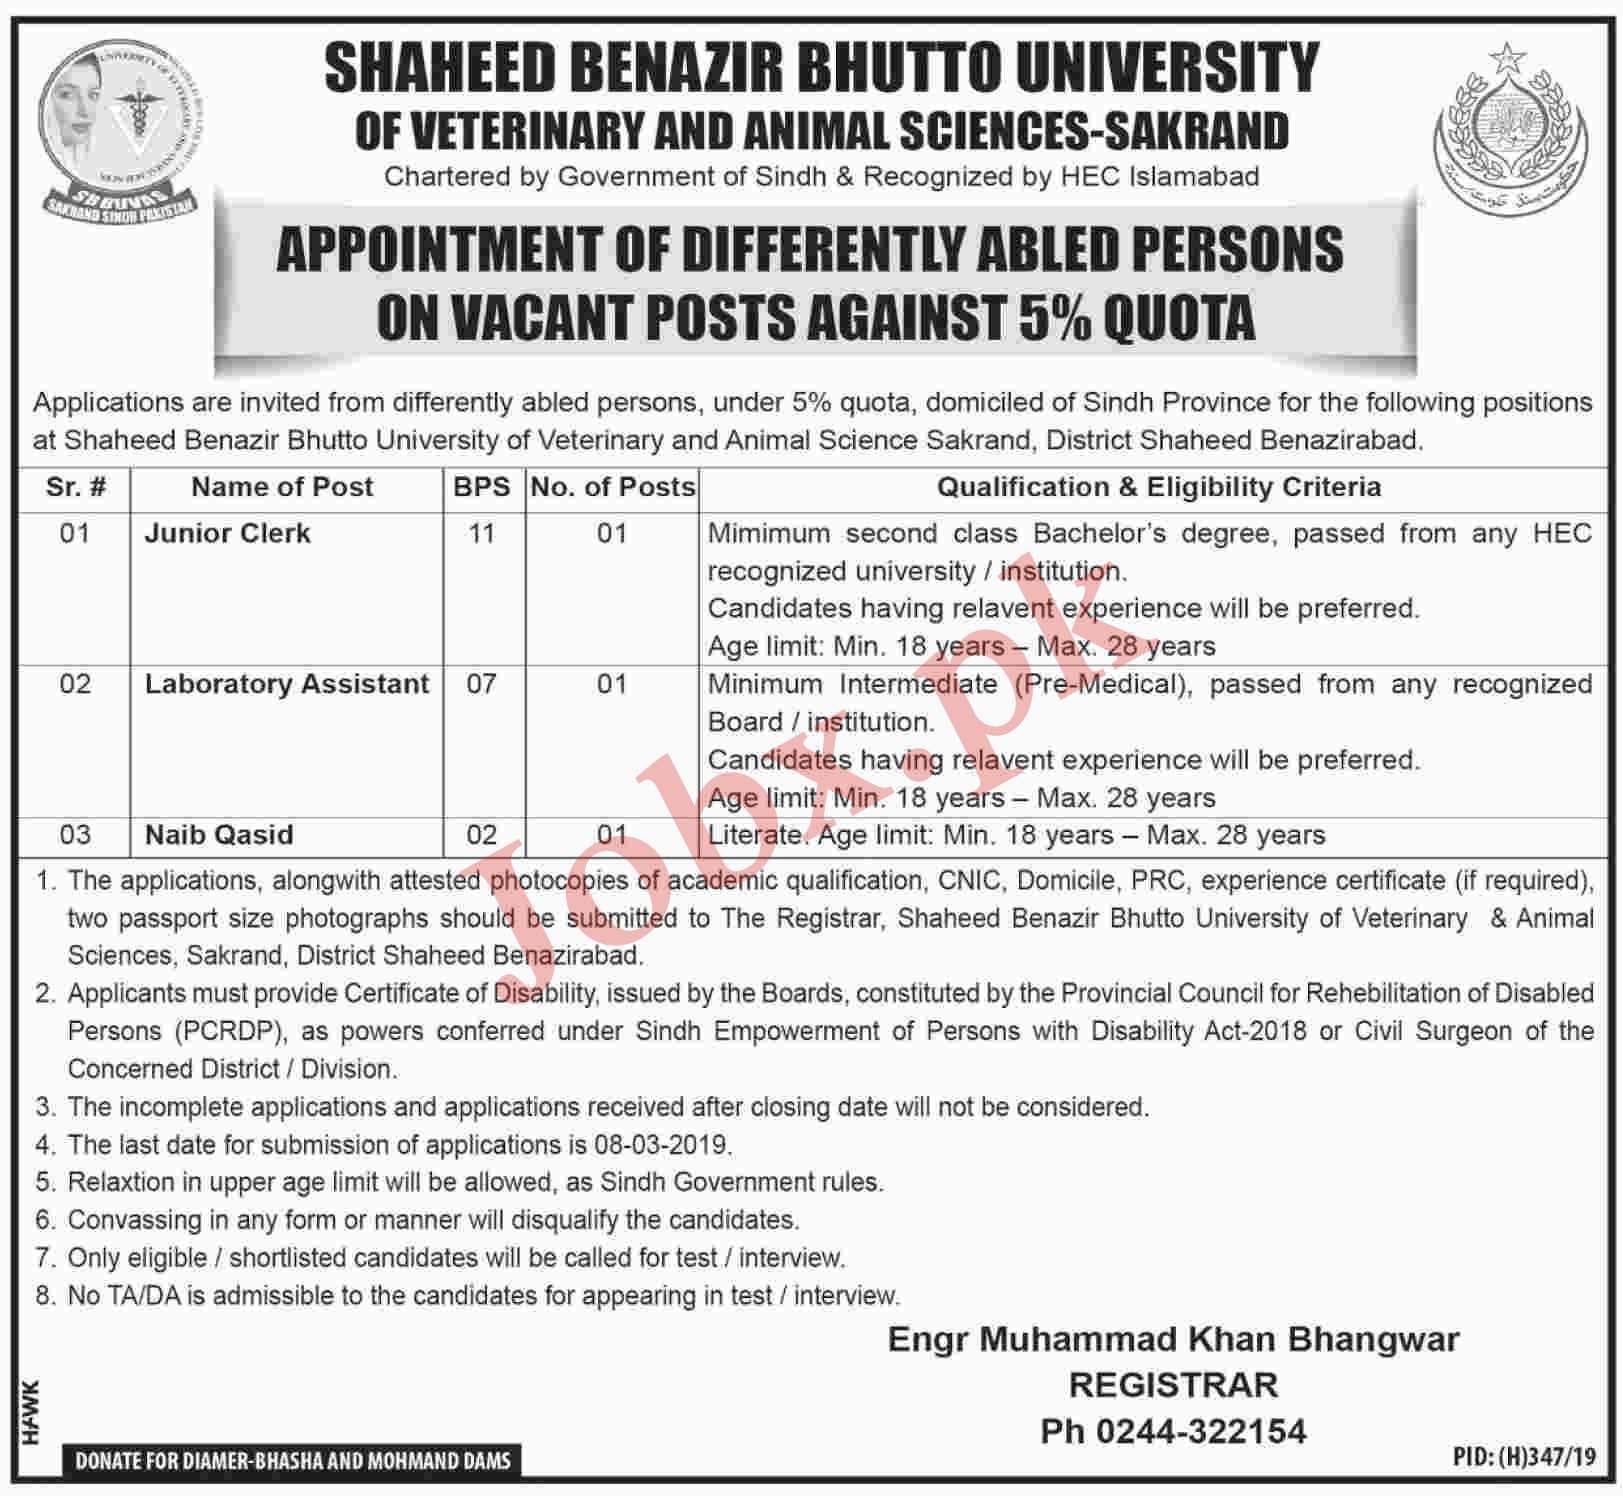 Latest Jobs in Shaheed Benazir Bhutto University in Sakrand 2019